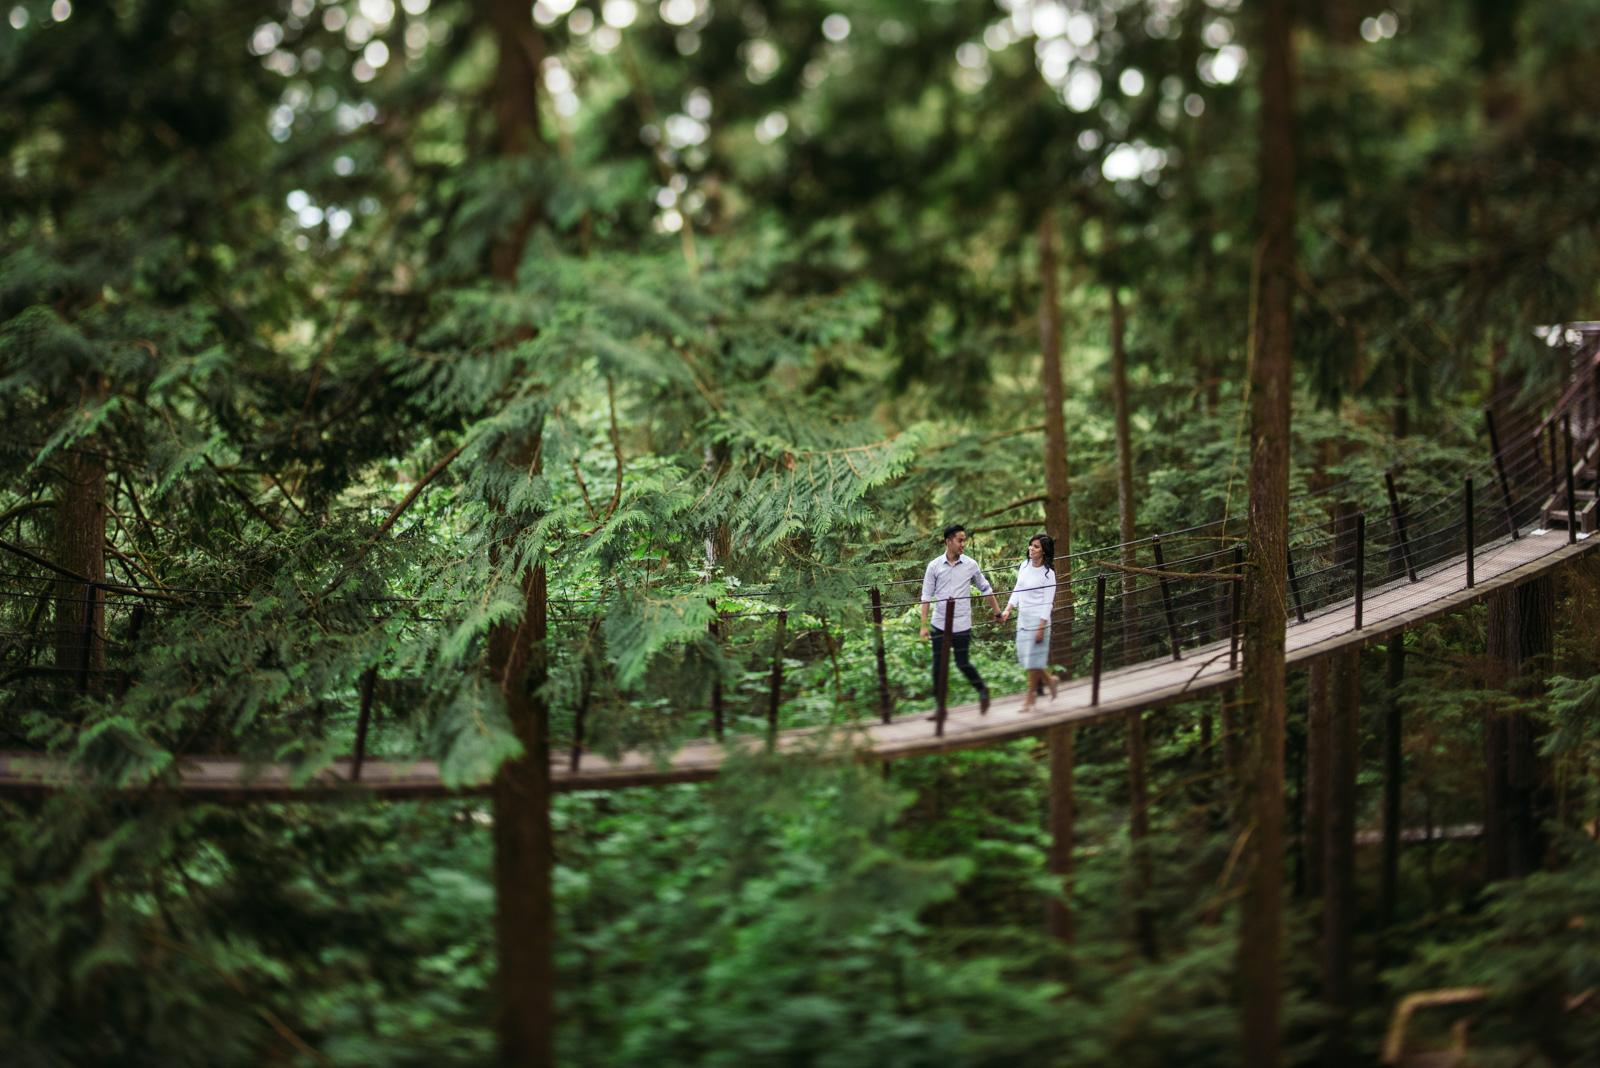 vancouver-island-wedding-photographers-capilano-suspension-bridge-engagement-14.jpg